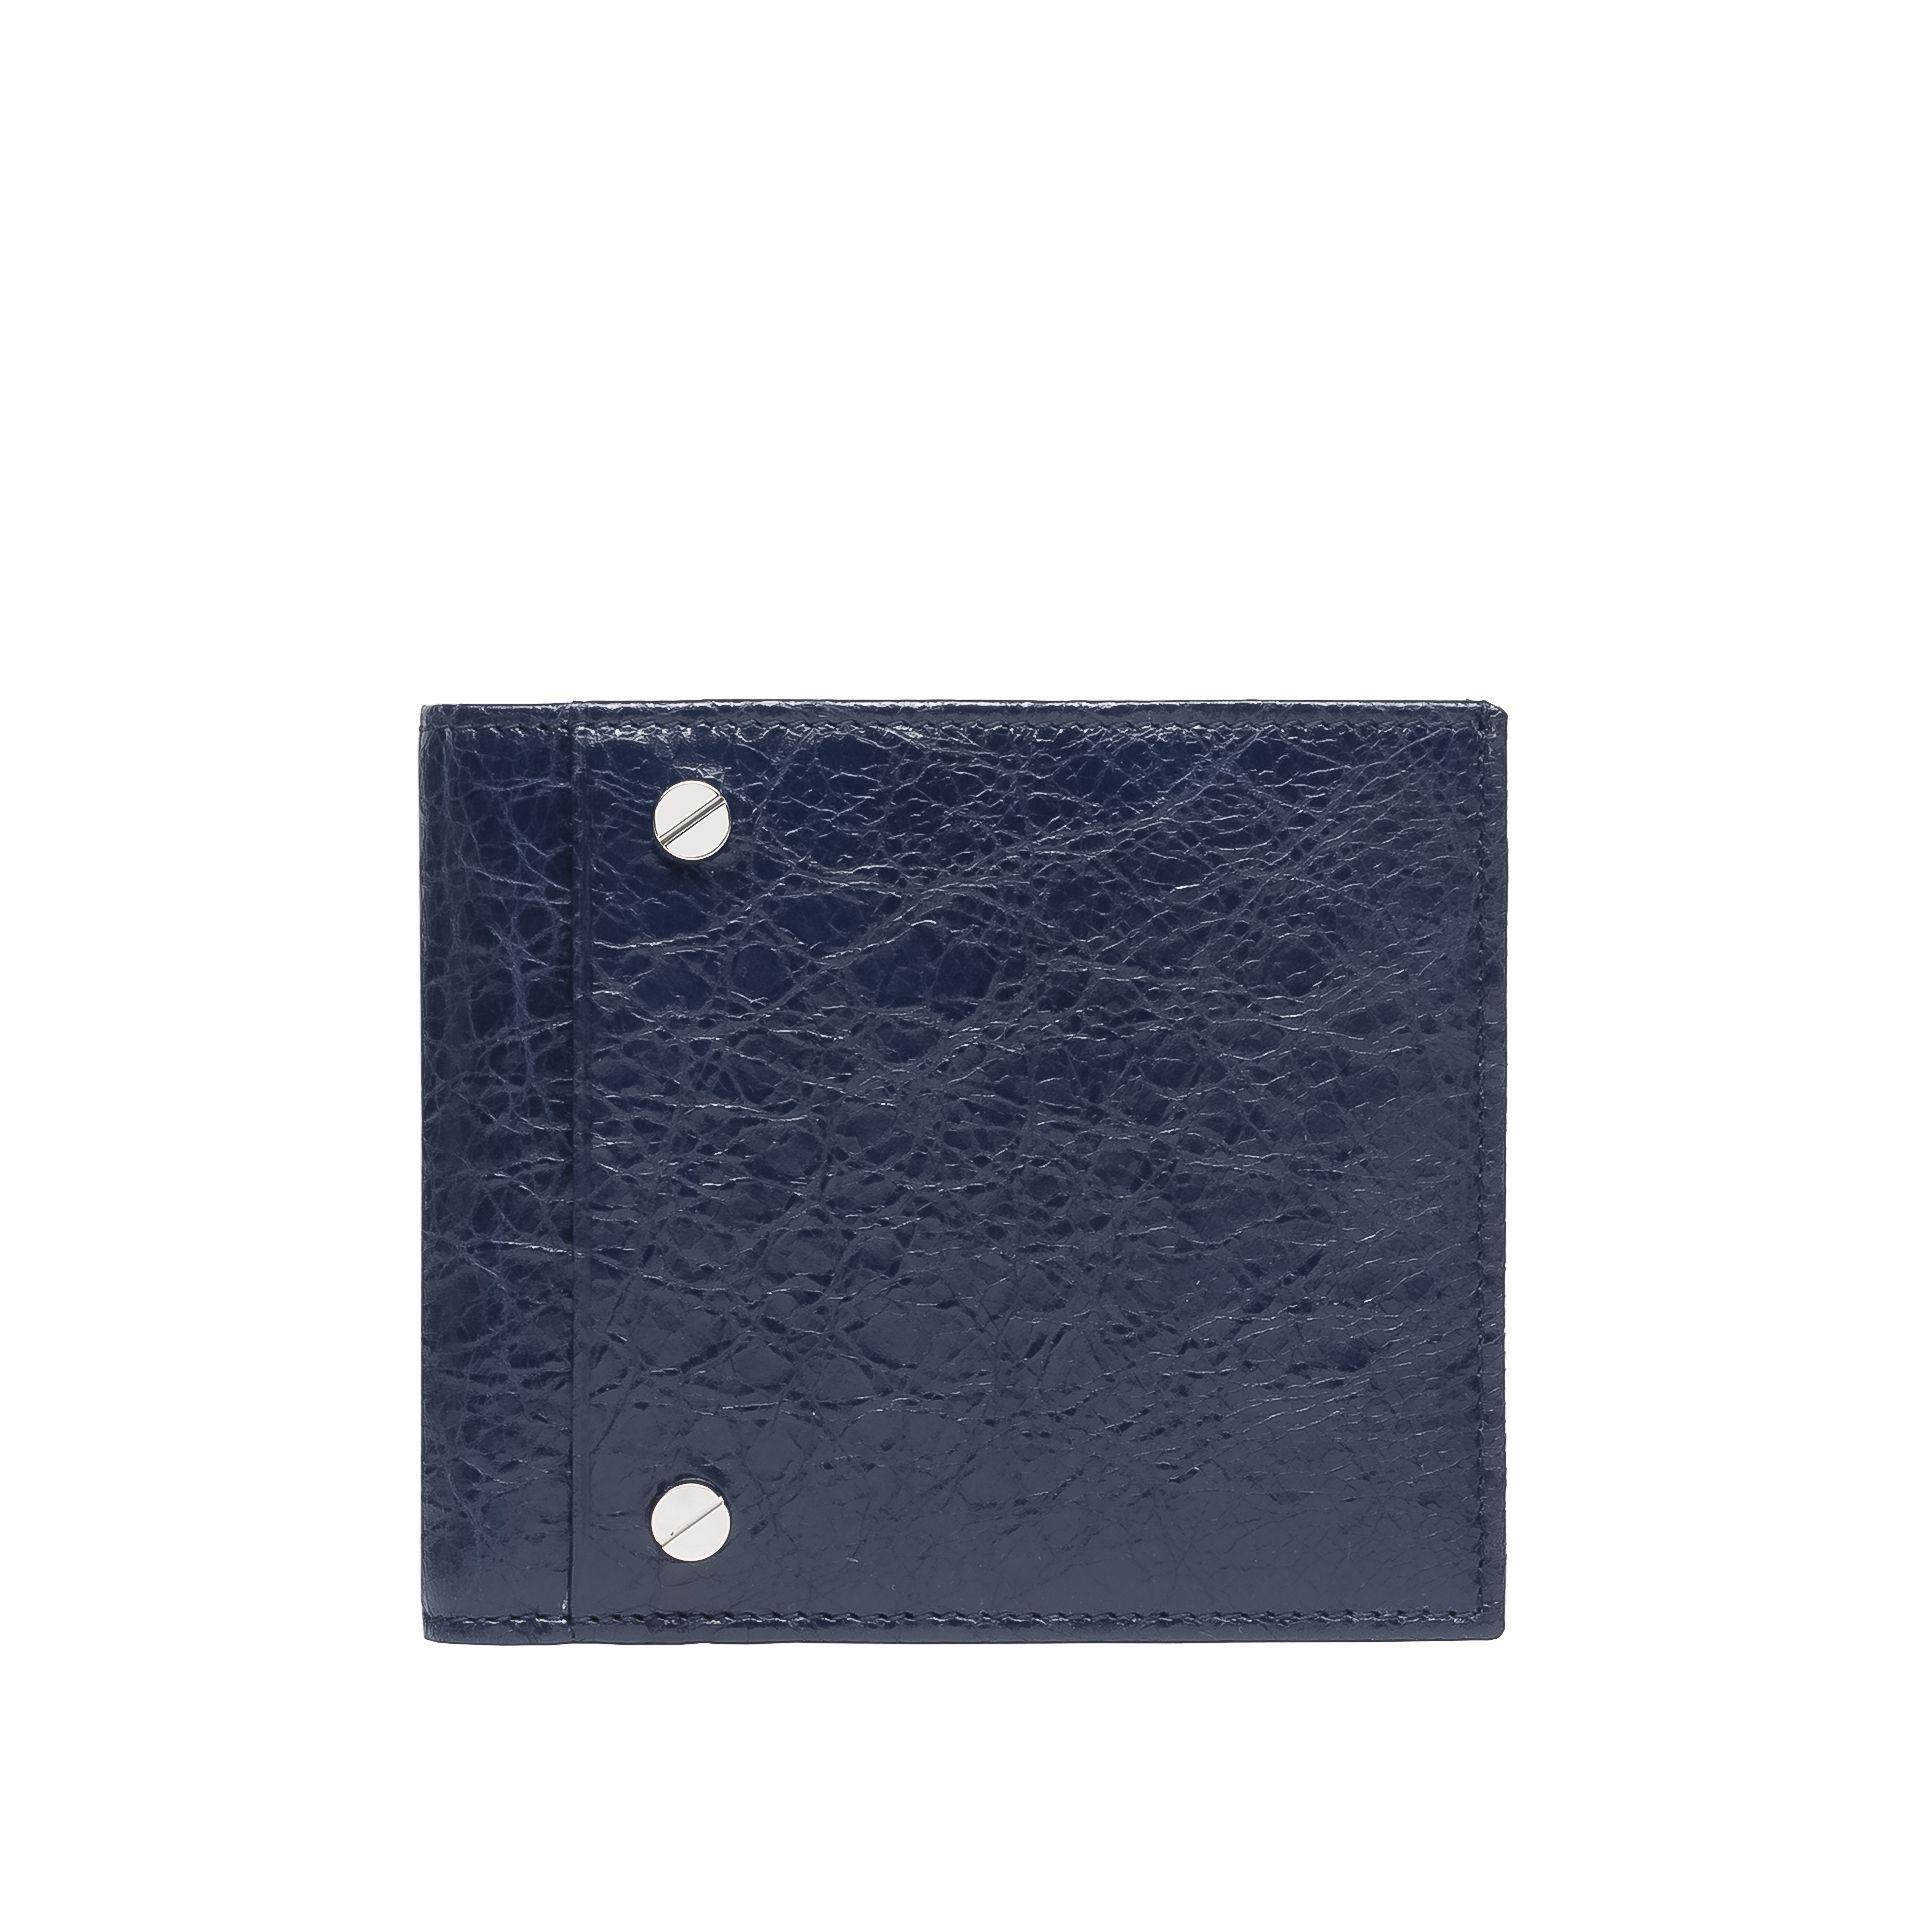 BALENCIAGA Balenciaga Square Wallet Wallet U f